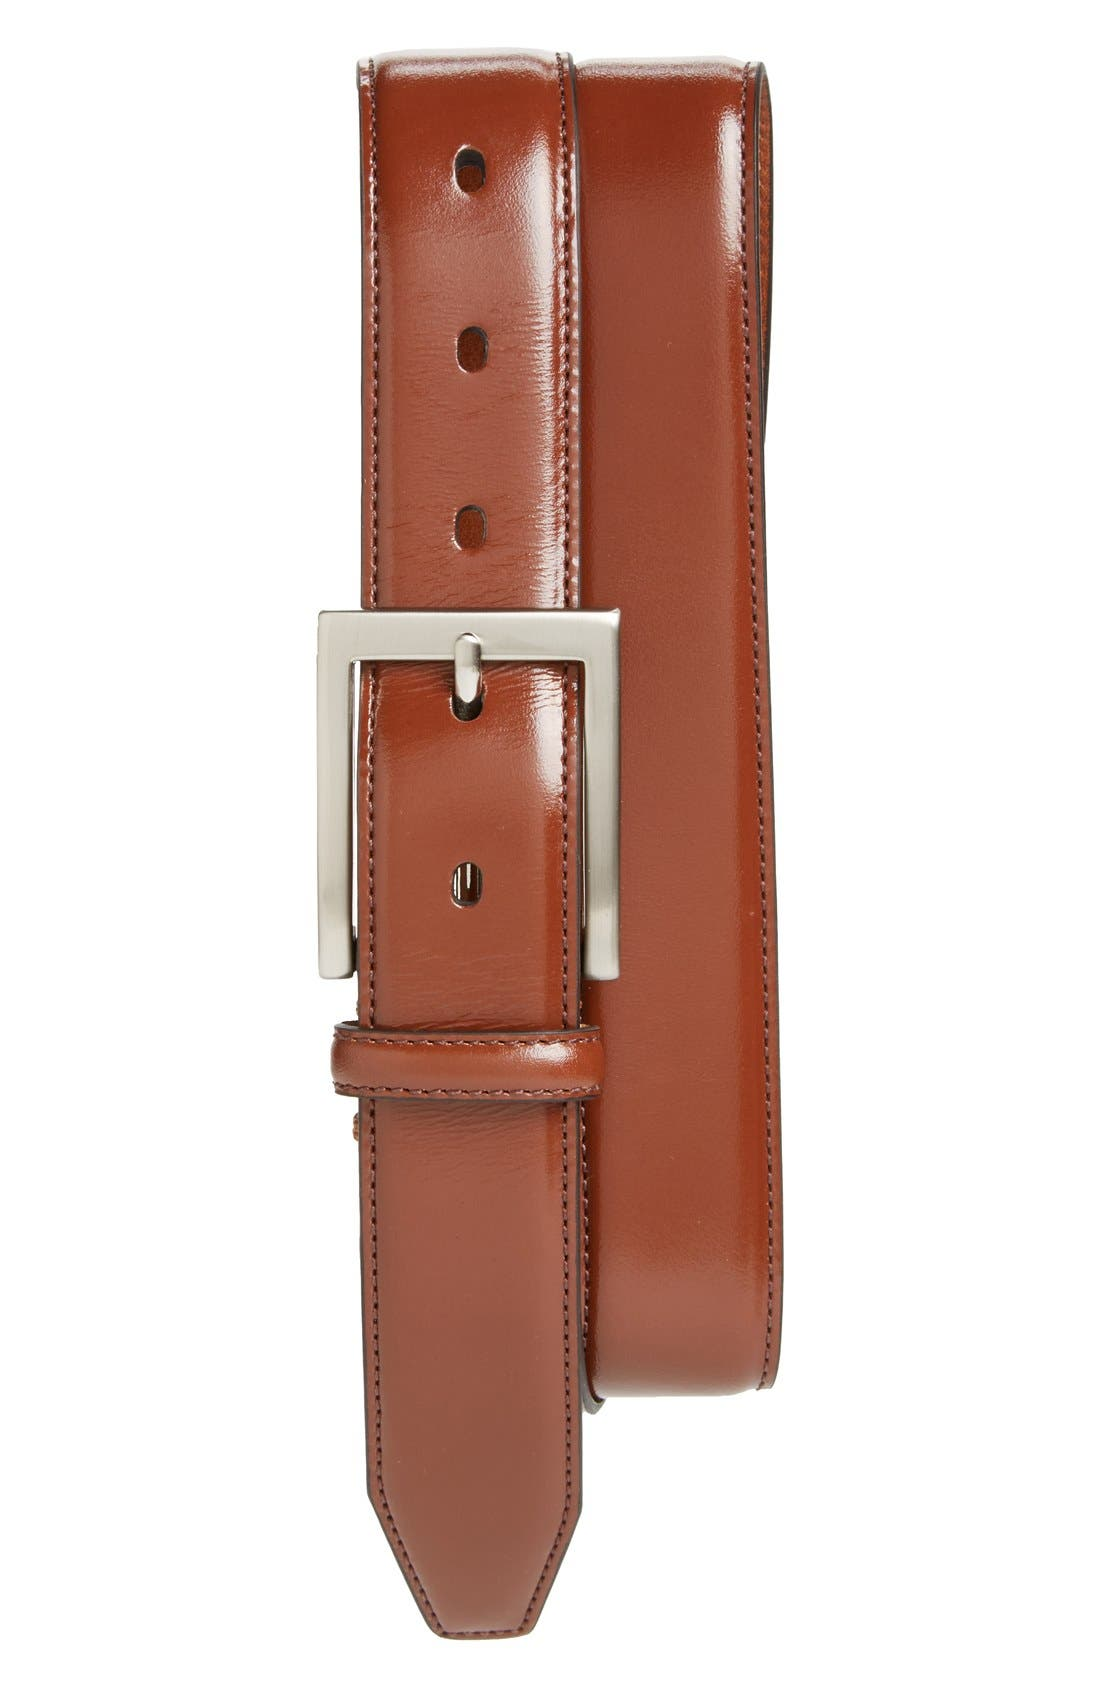 Johnston & Murphy Calfskin Belt, Saddle Tan